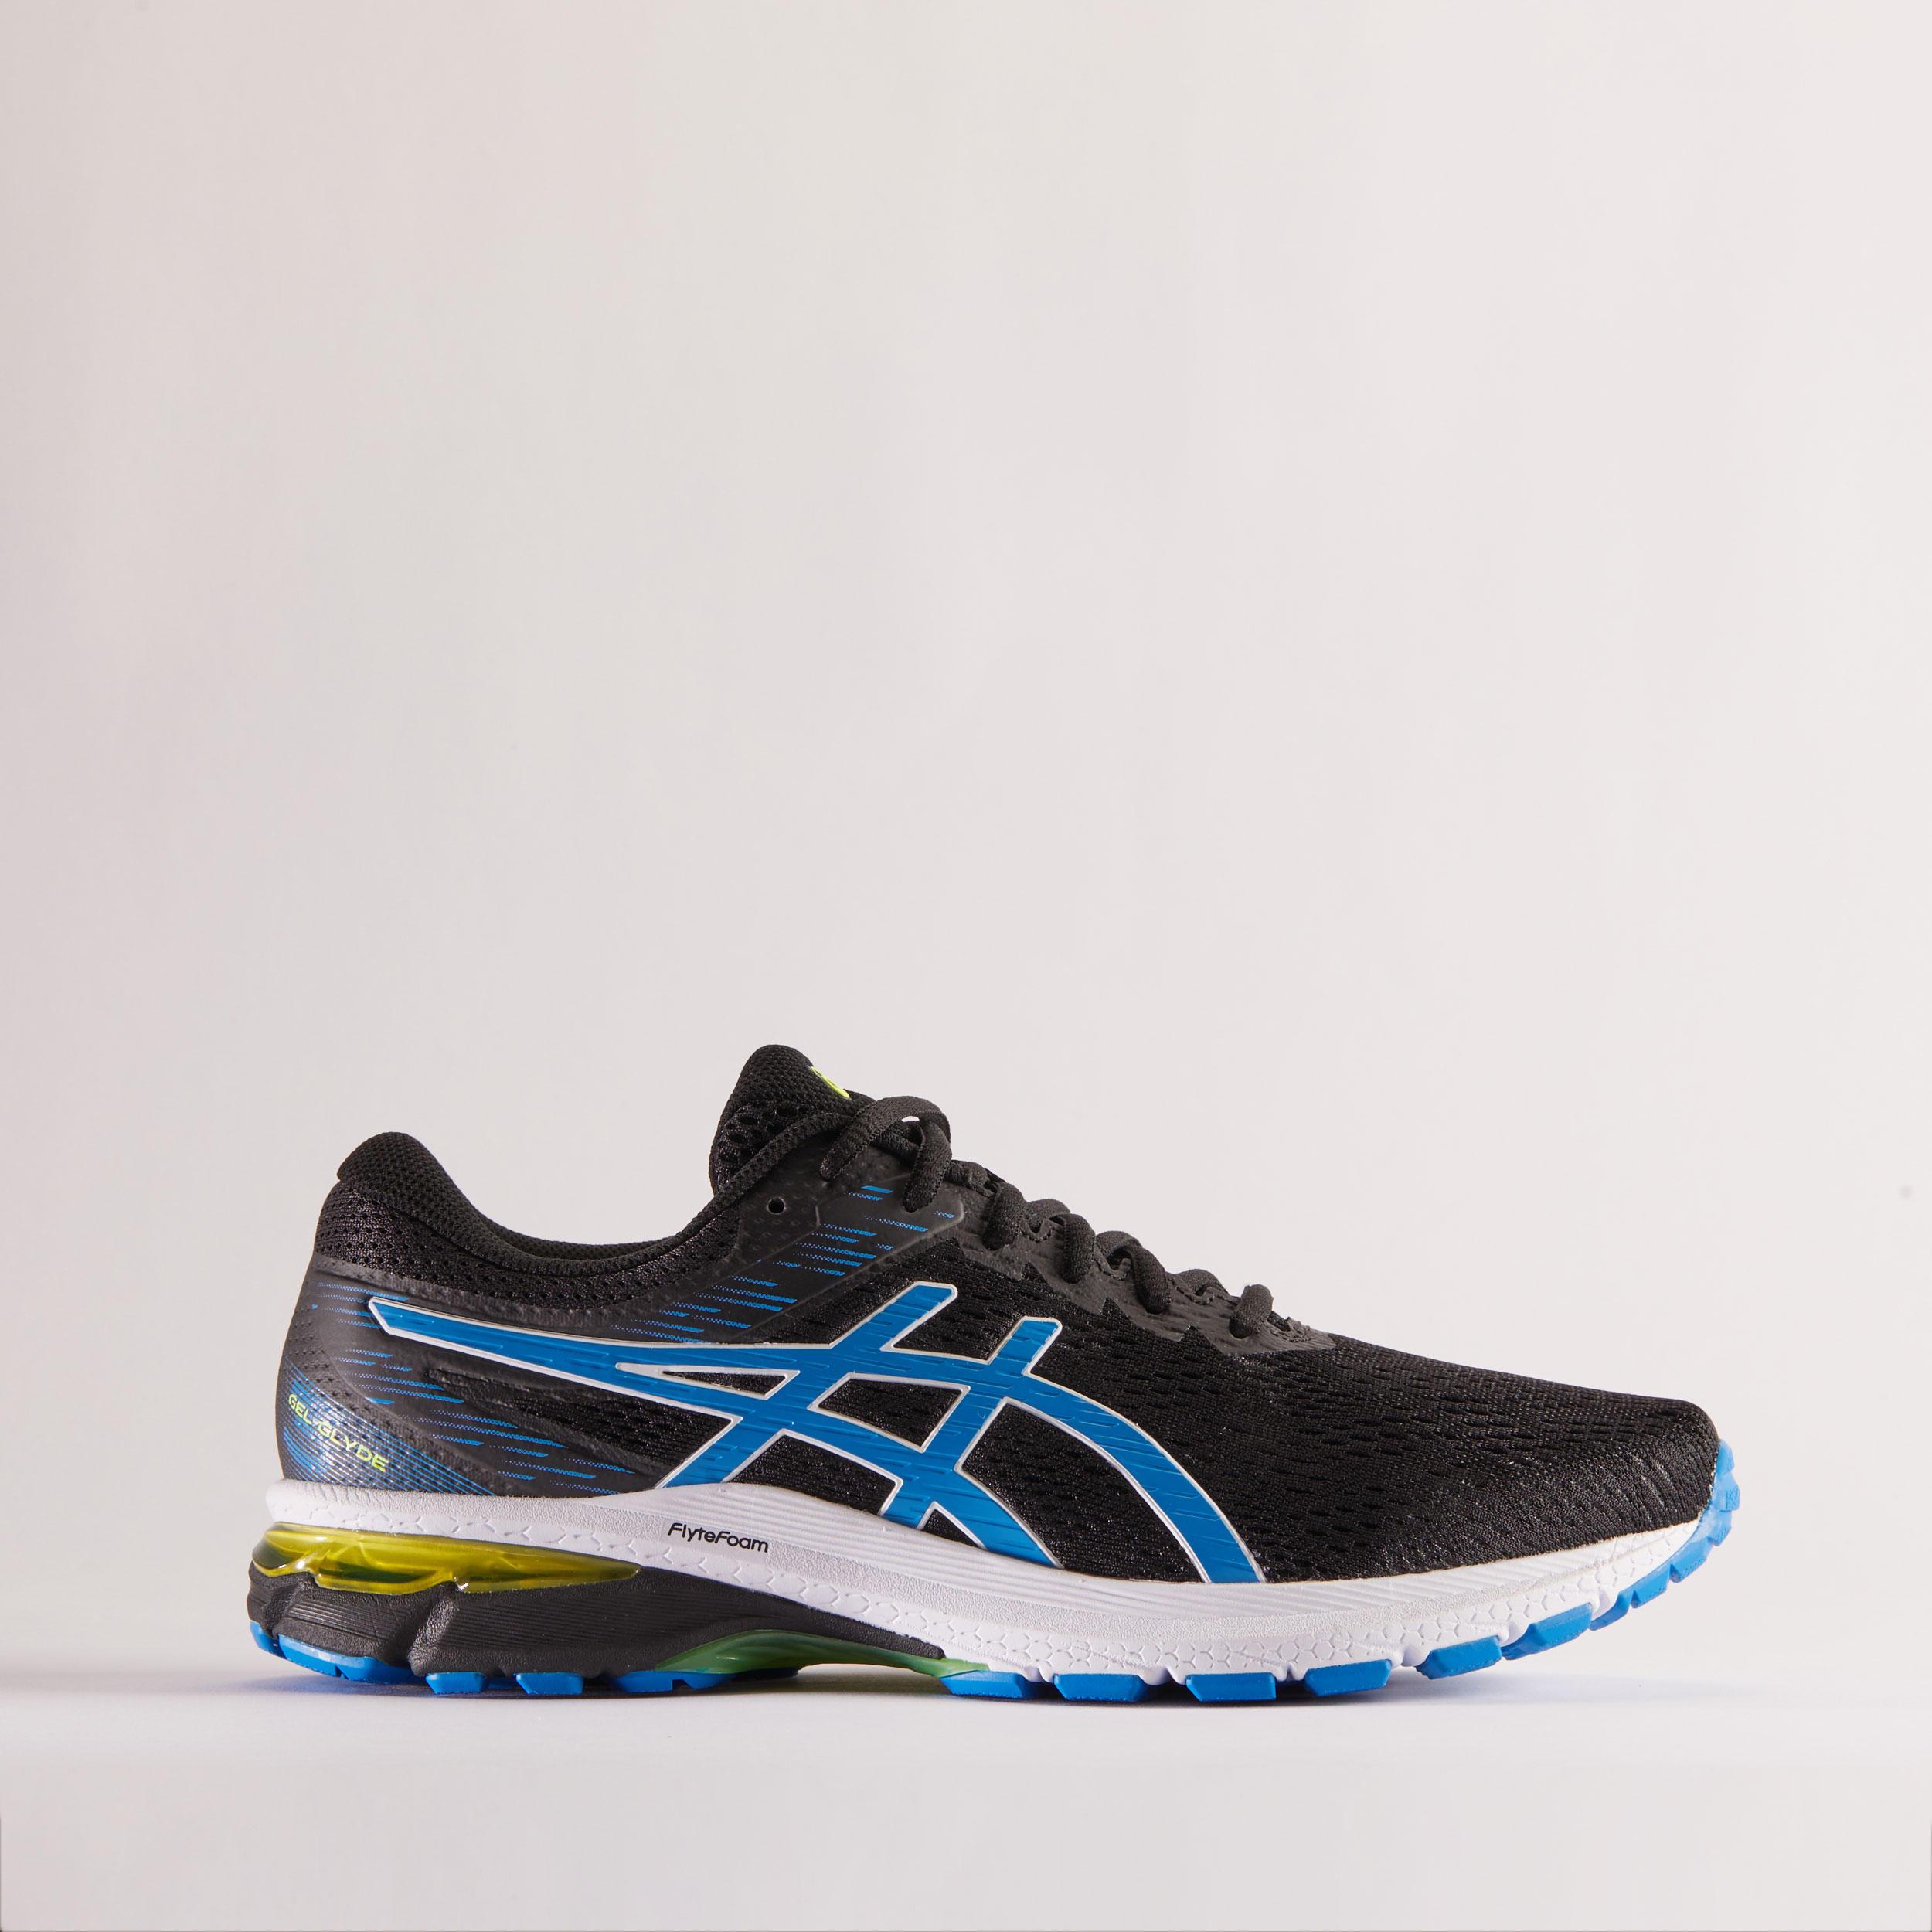 Chaussures running homme Asics | DECATHLON | Decathlon